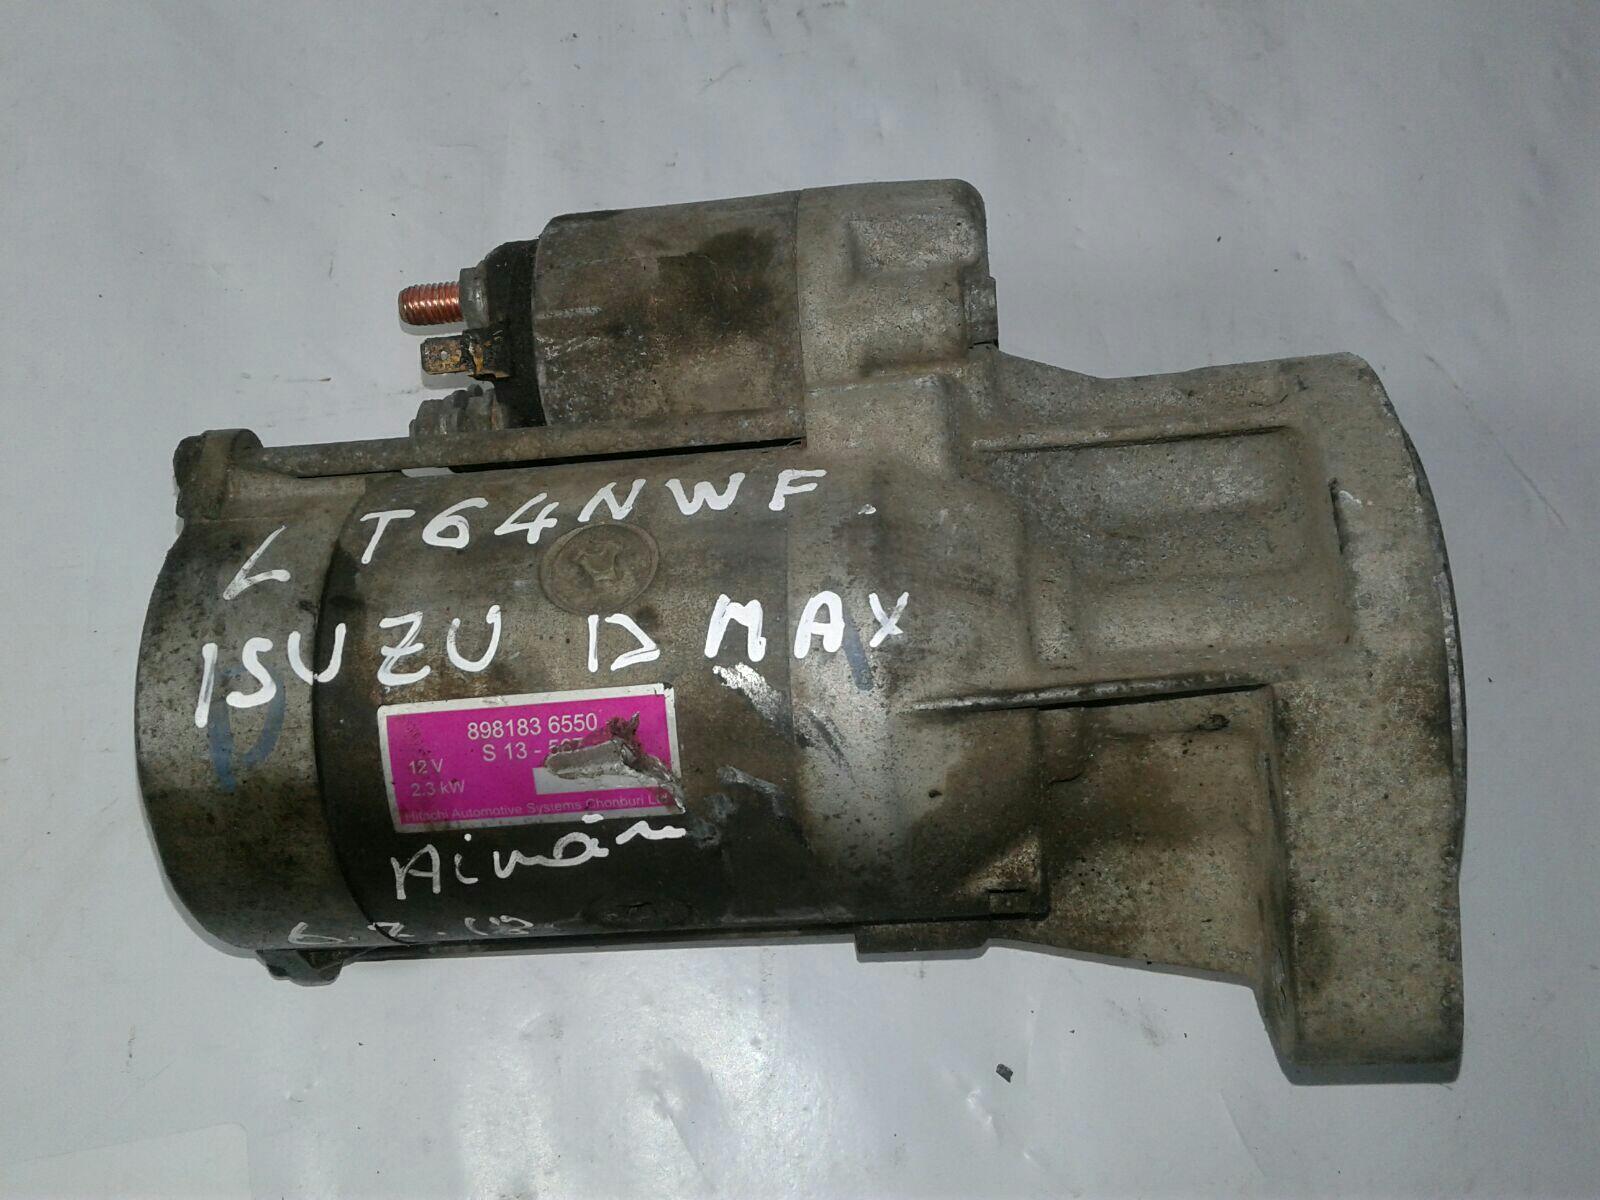 STARTER MOTOR DMAX 2012 To 2017 Isuzu DMAX 2.5 Diesel Manual 4JK1 - 5226144